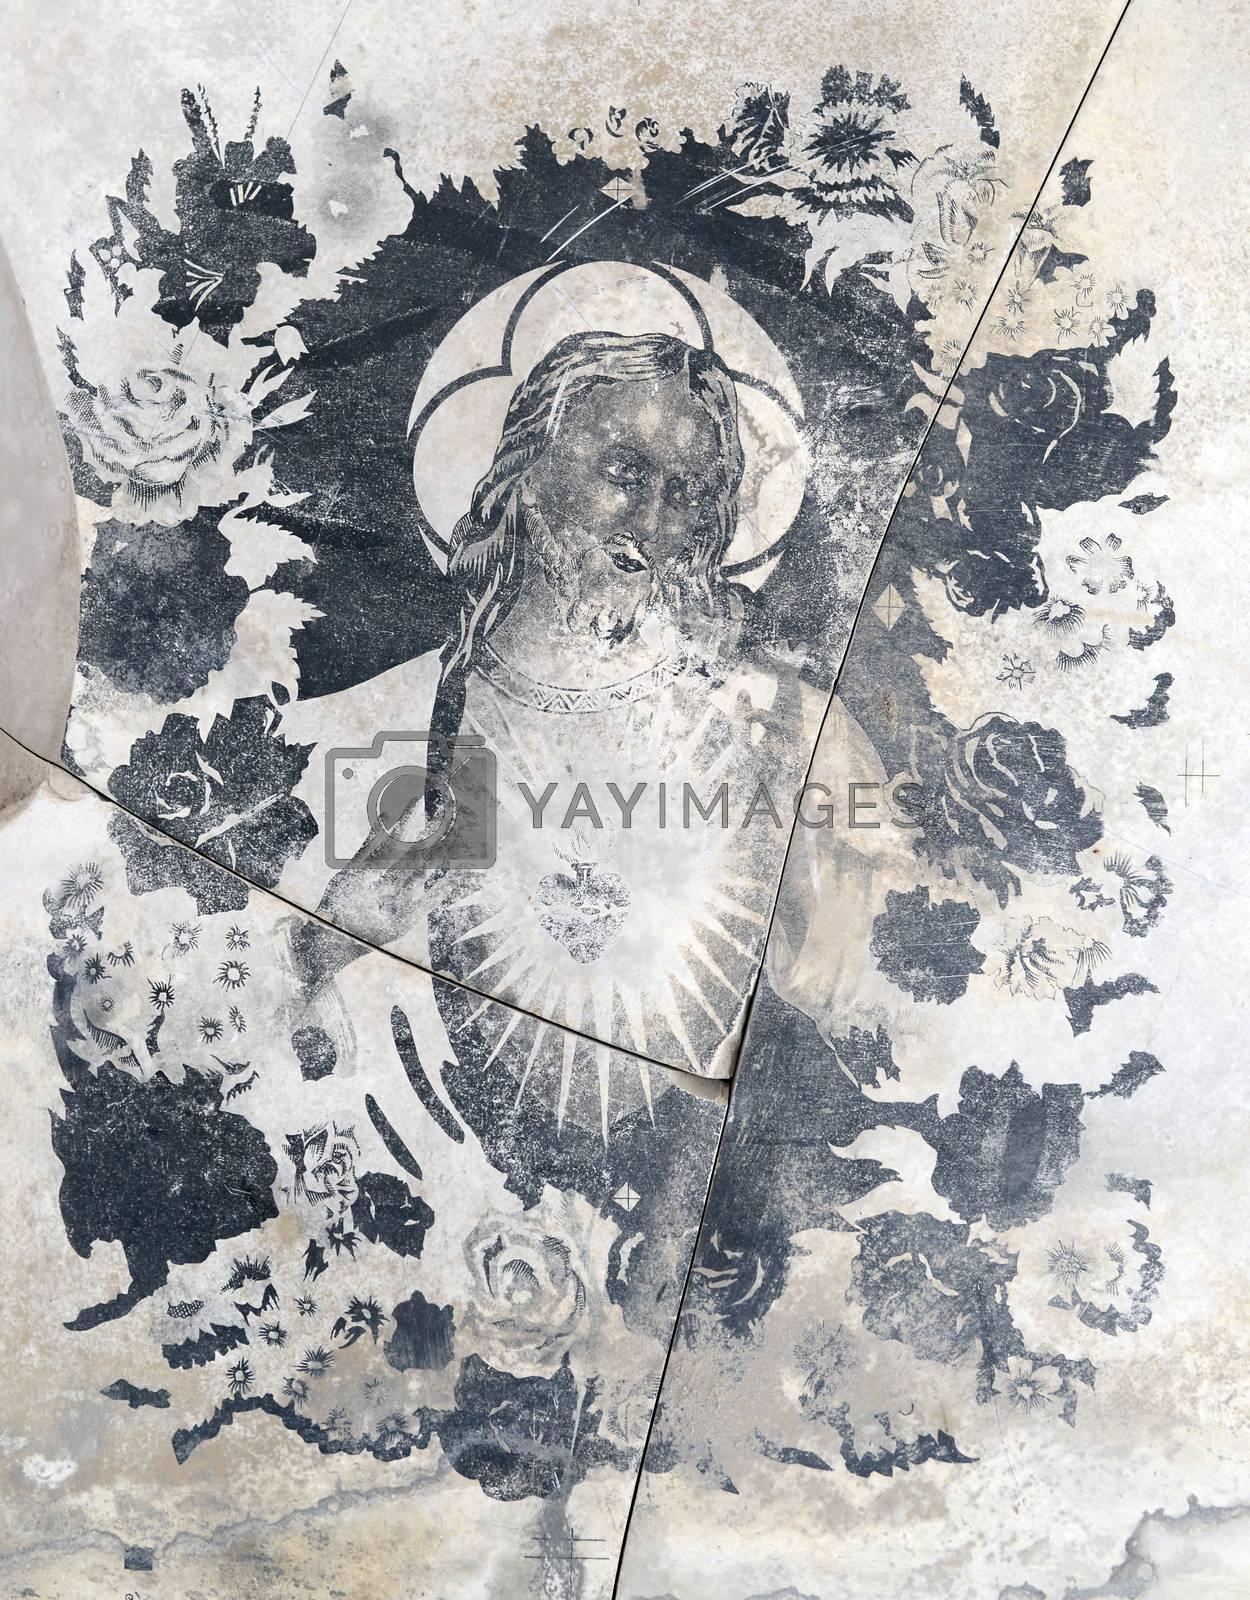 Royalty free image of religious icon by tony4urban